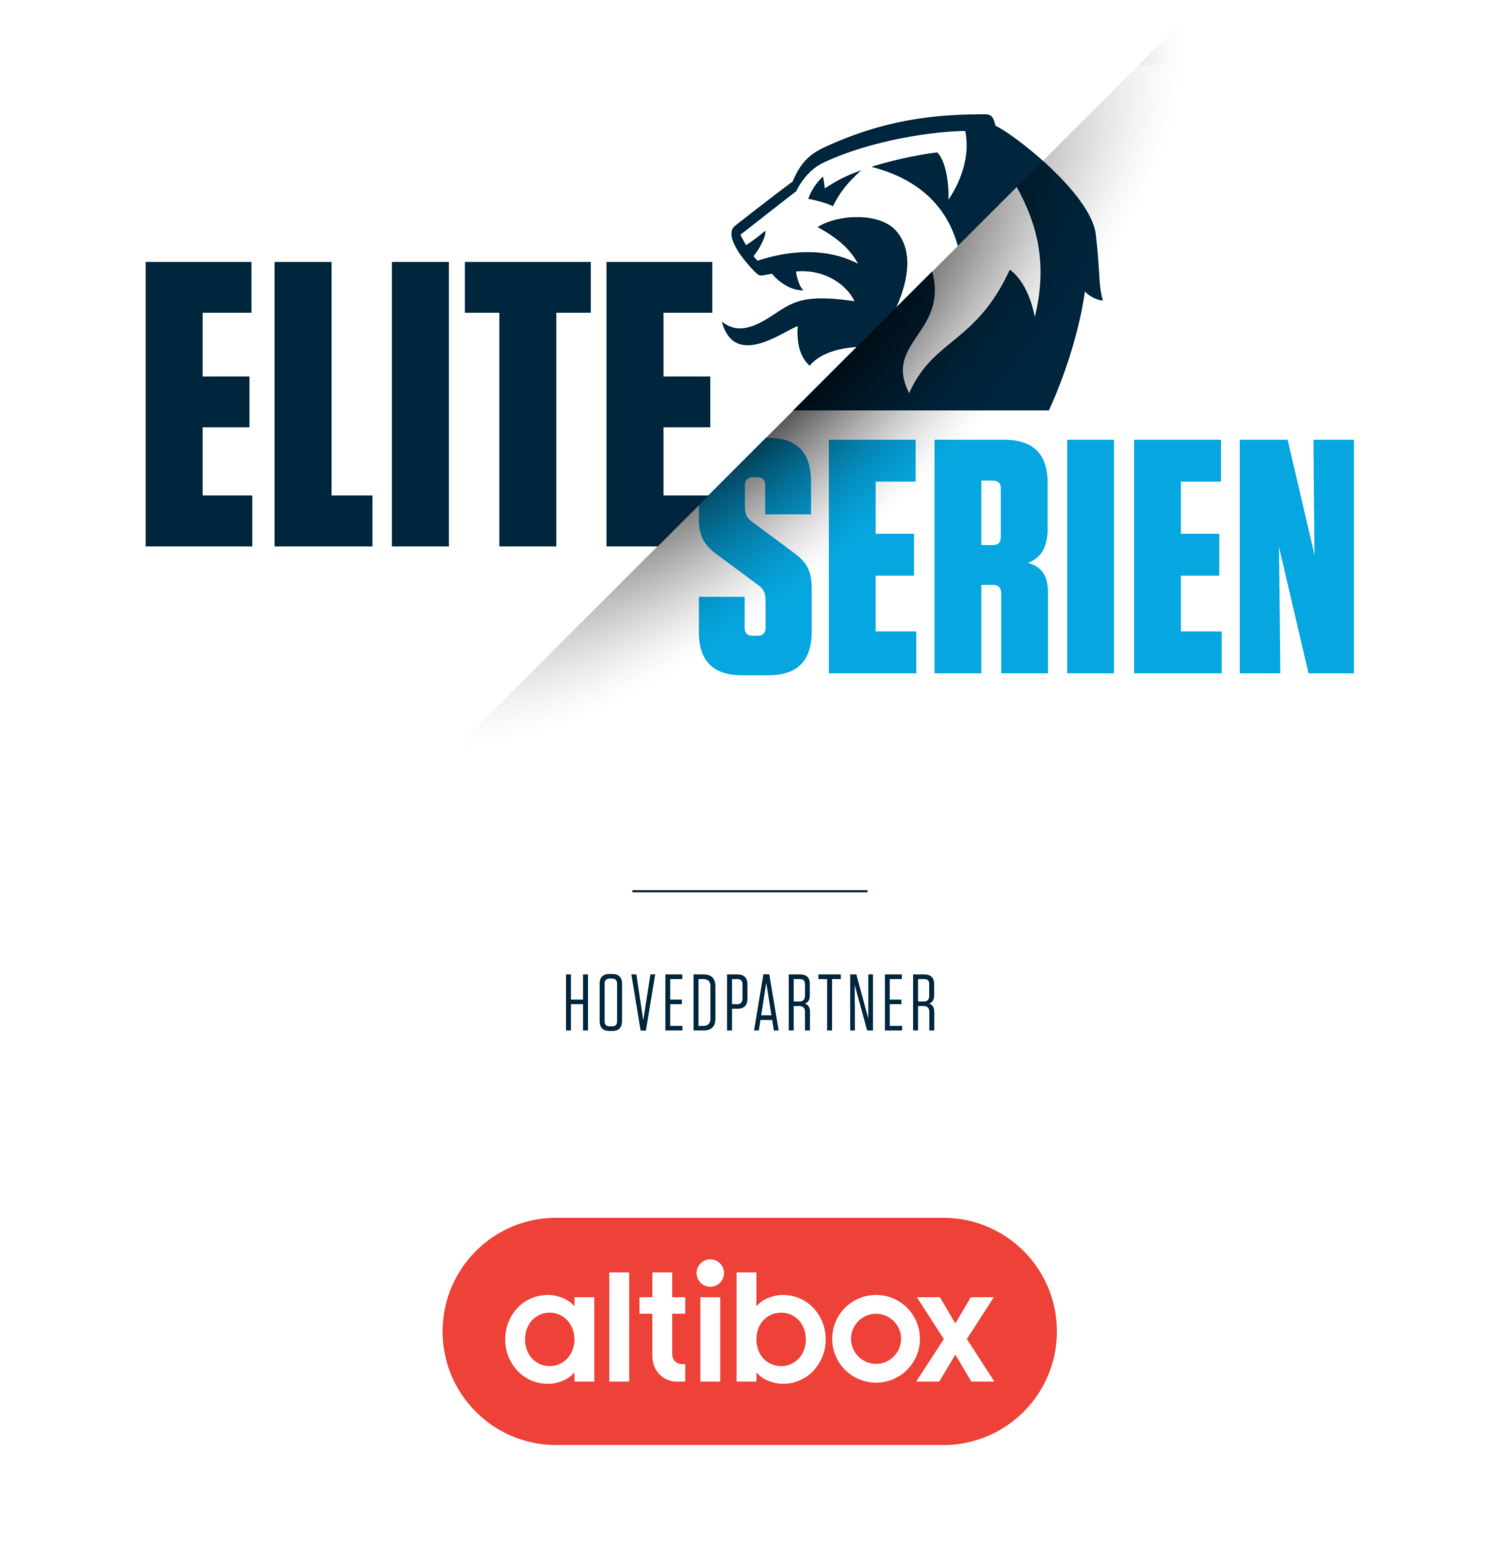 eliteserien-altibox